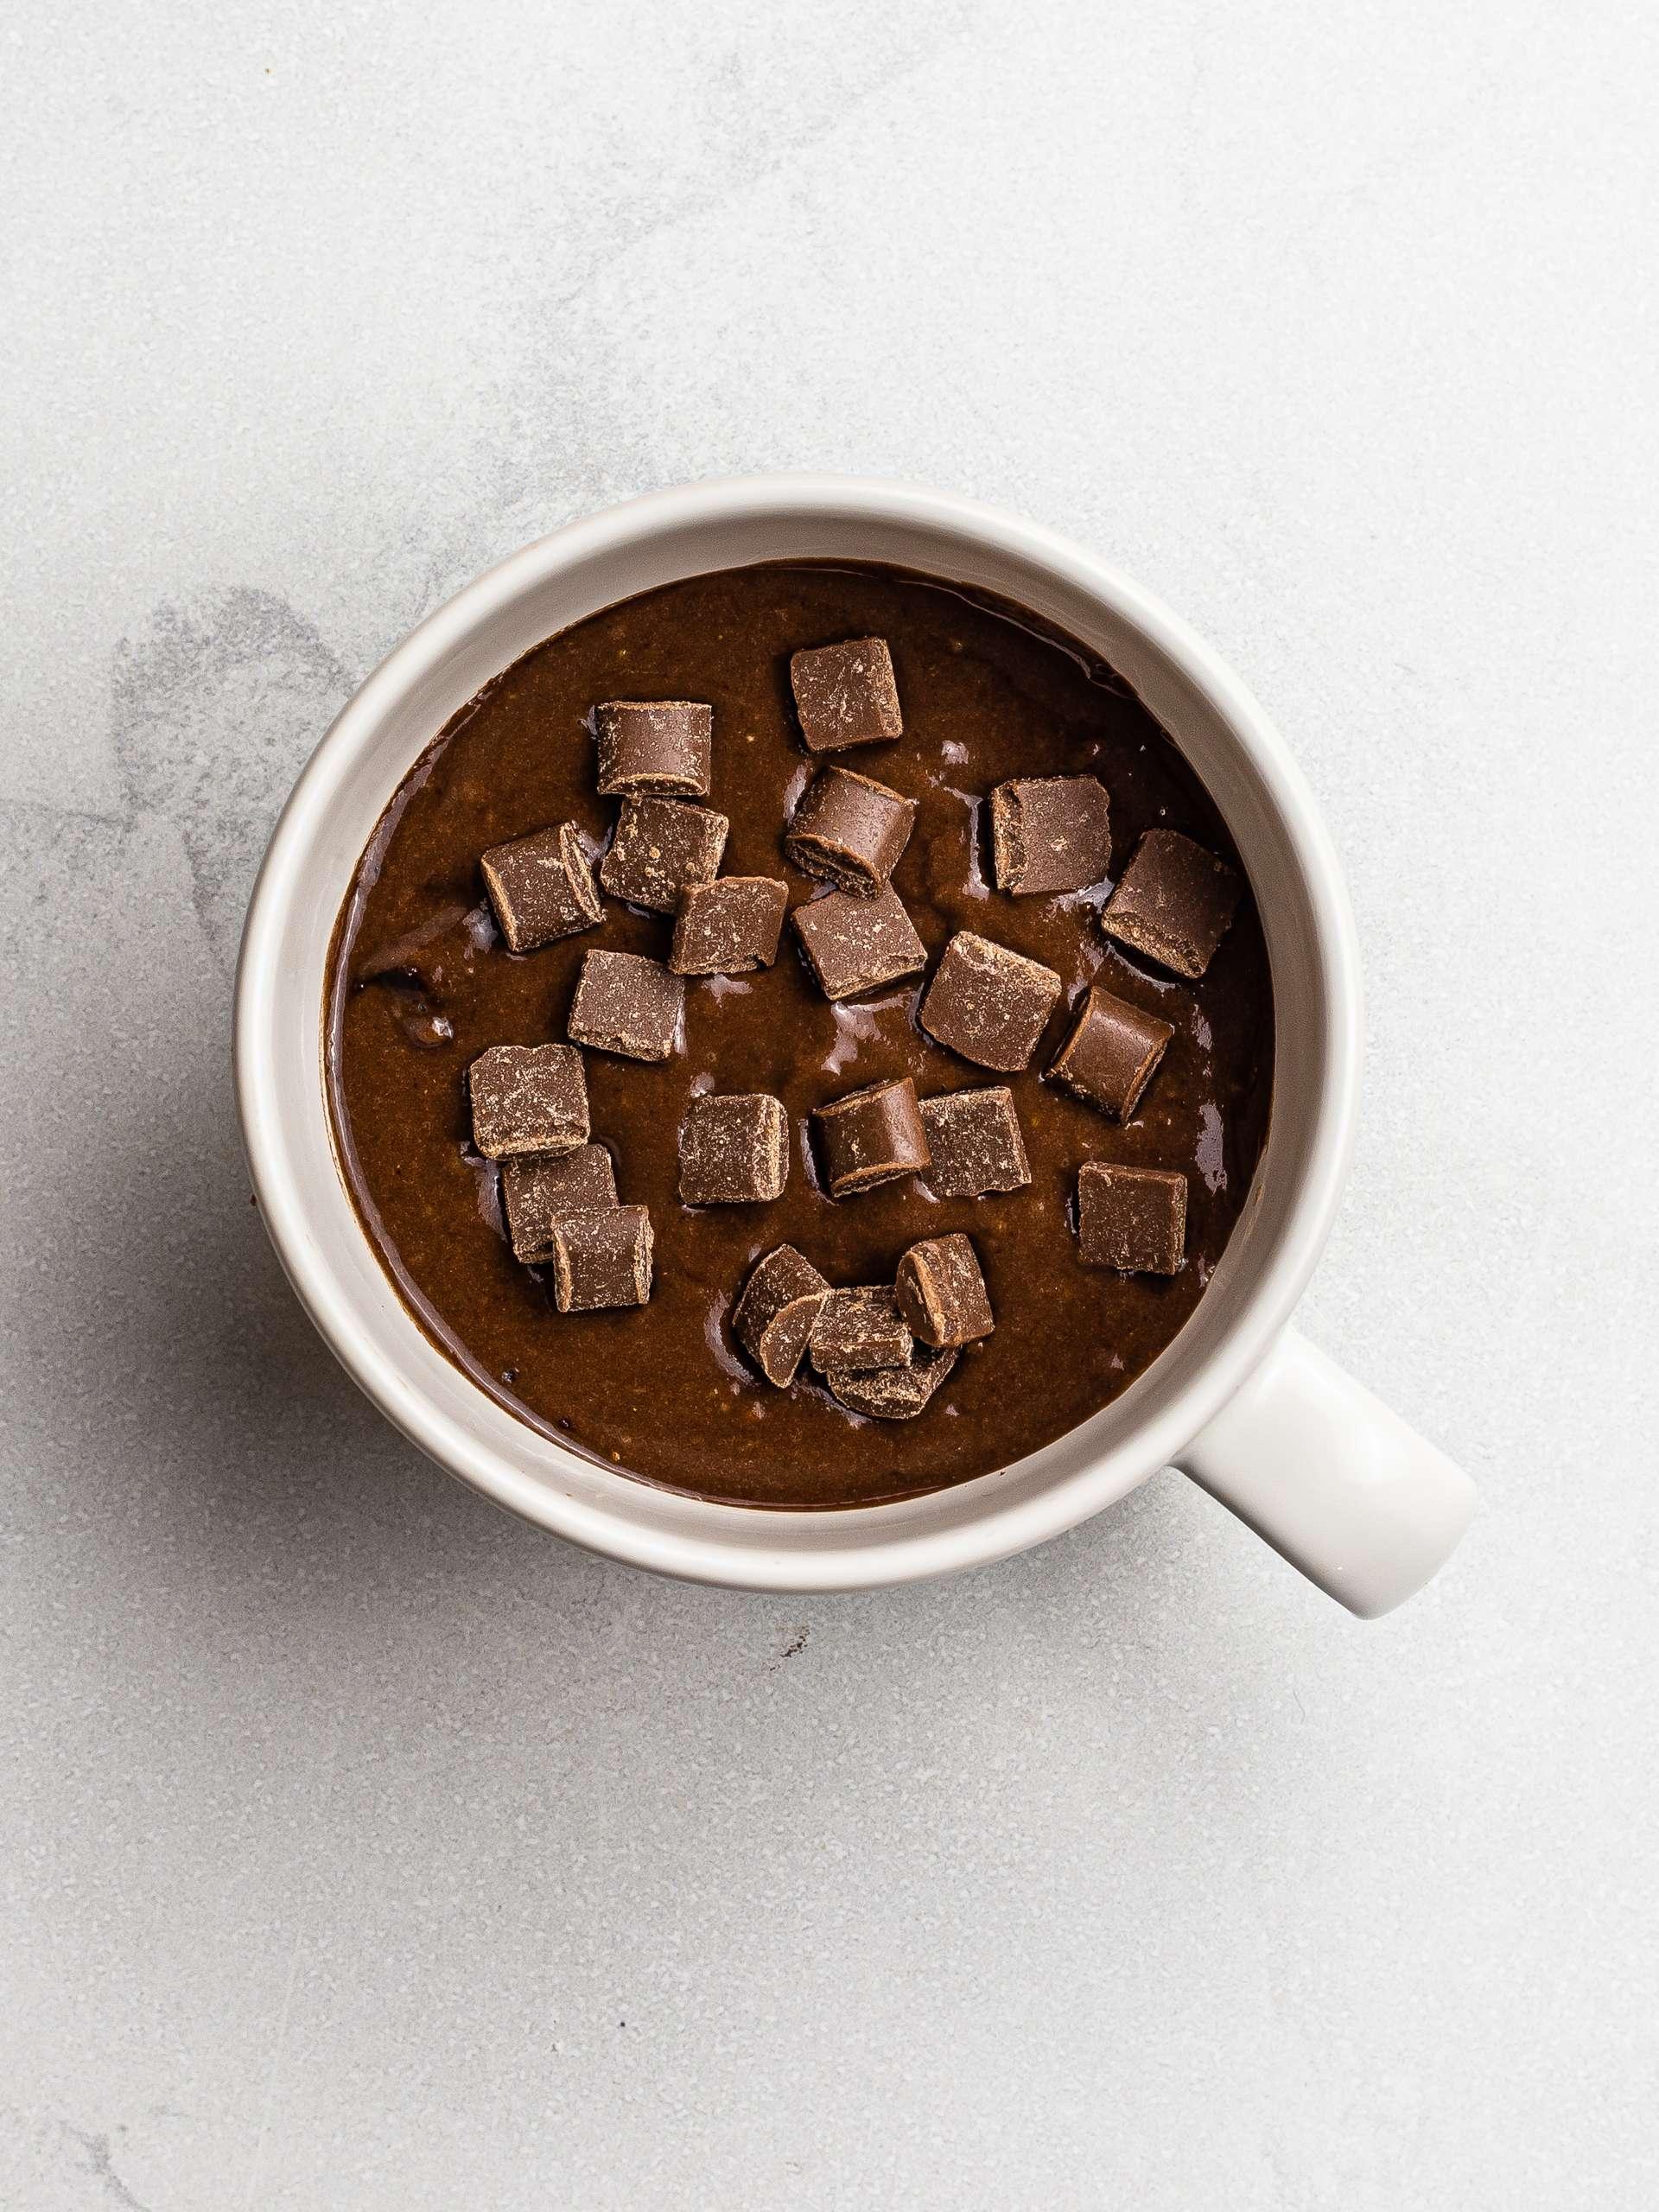 vegan chocolate mug brownie with chocolate chips